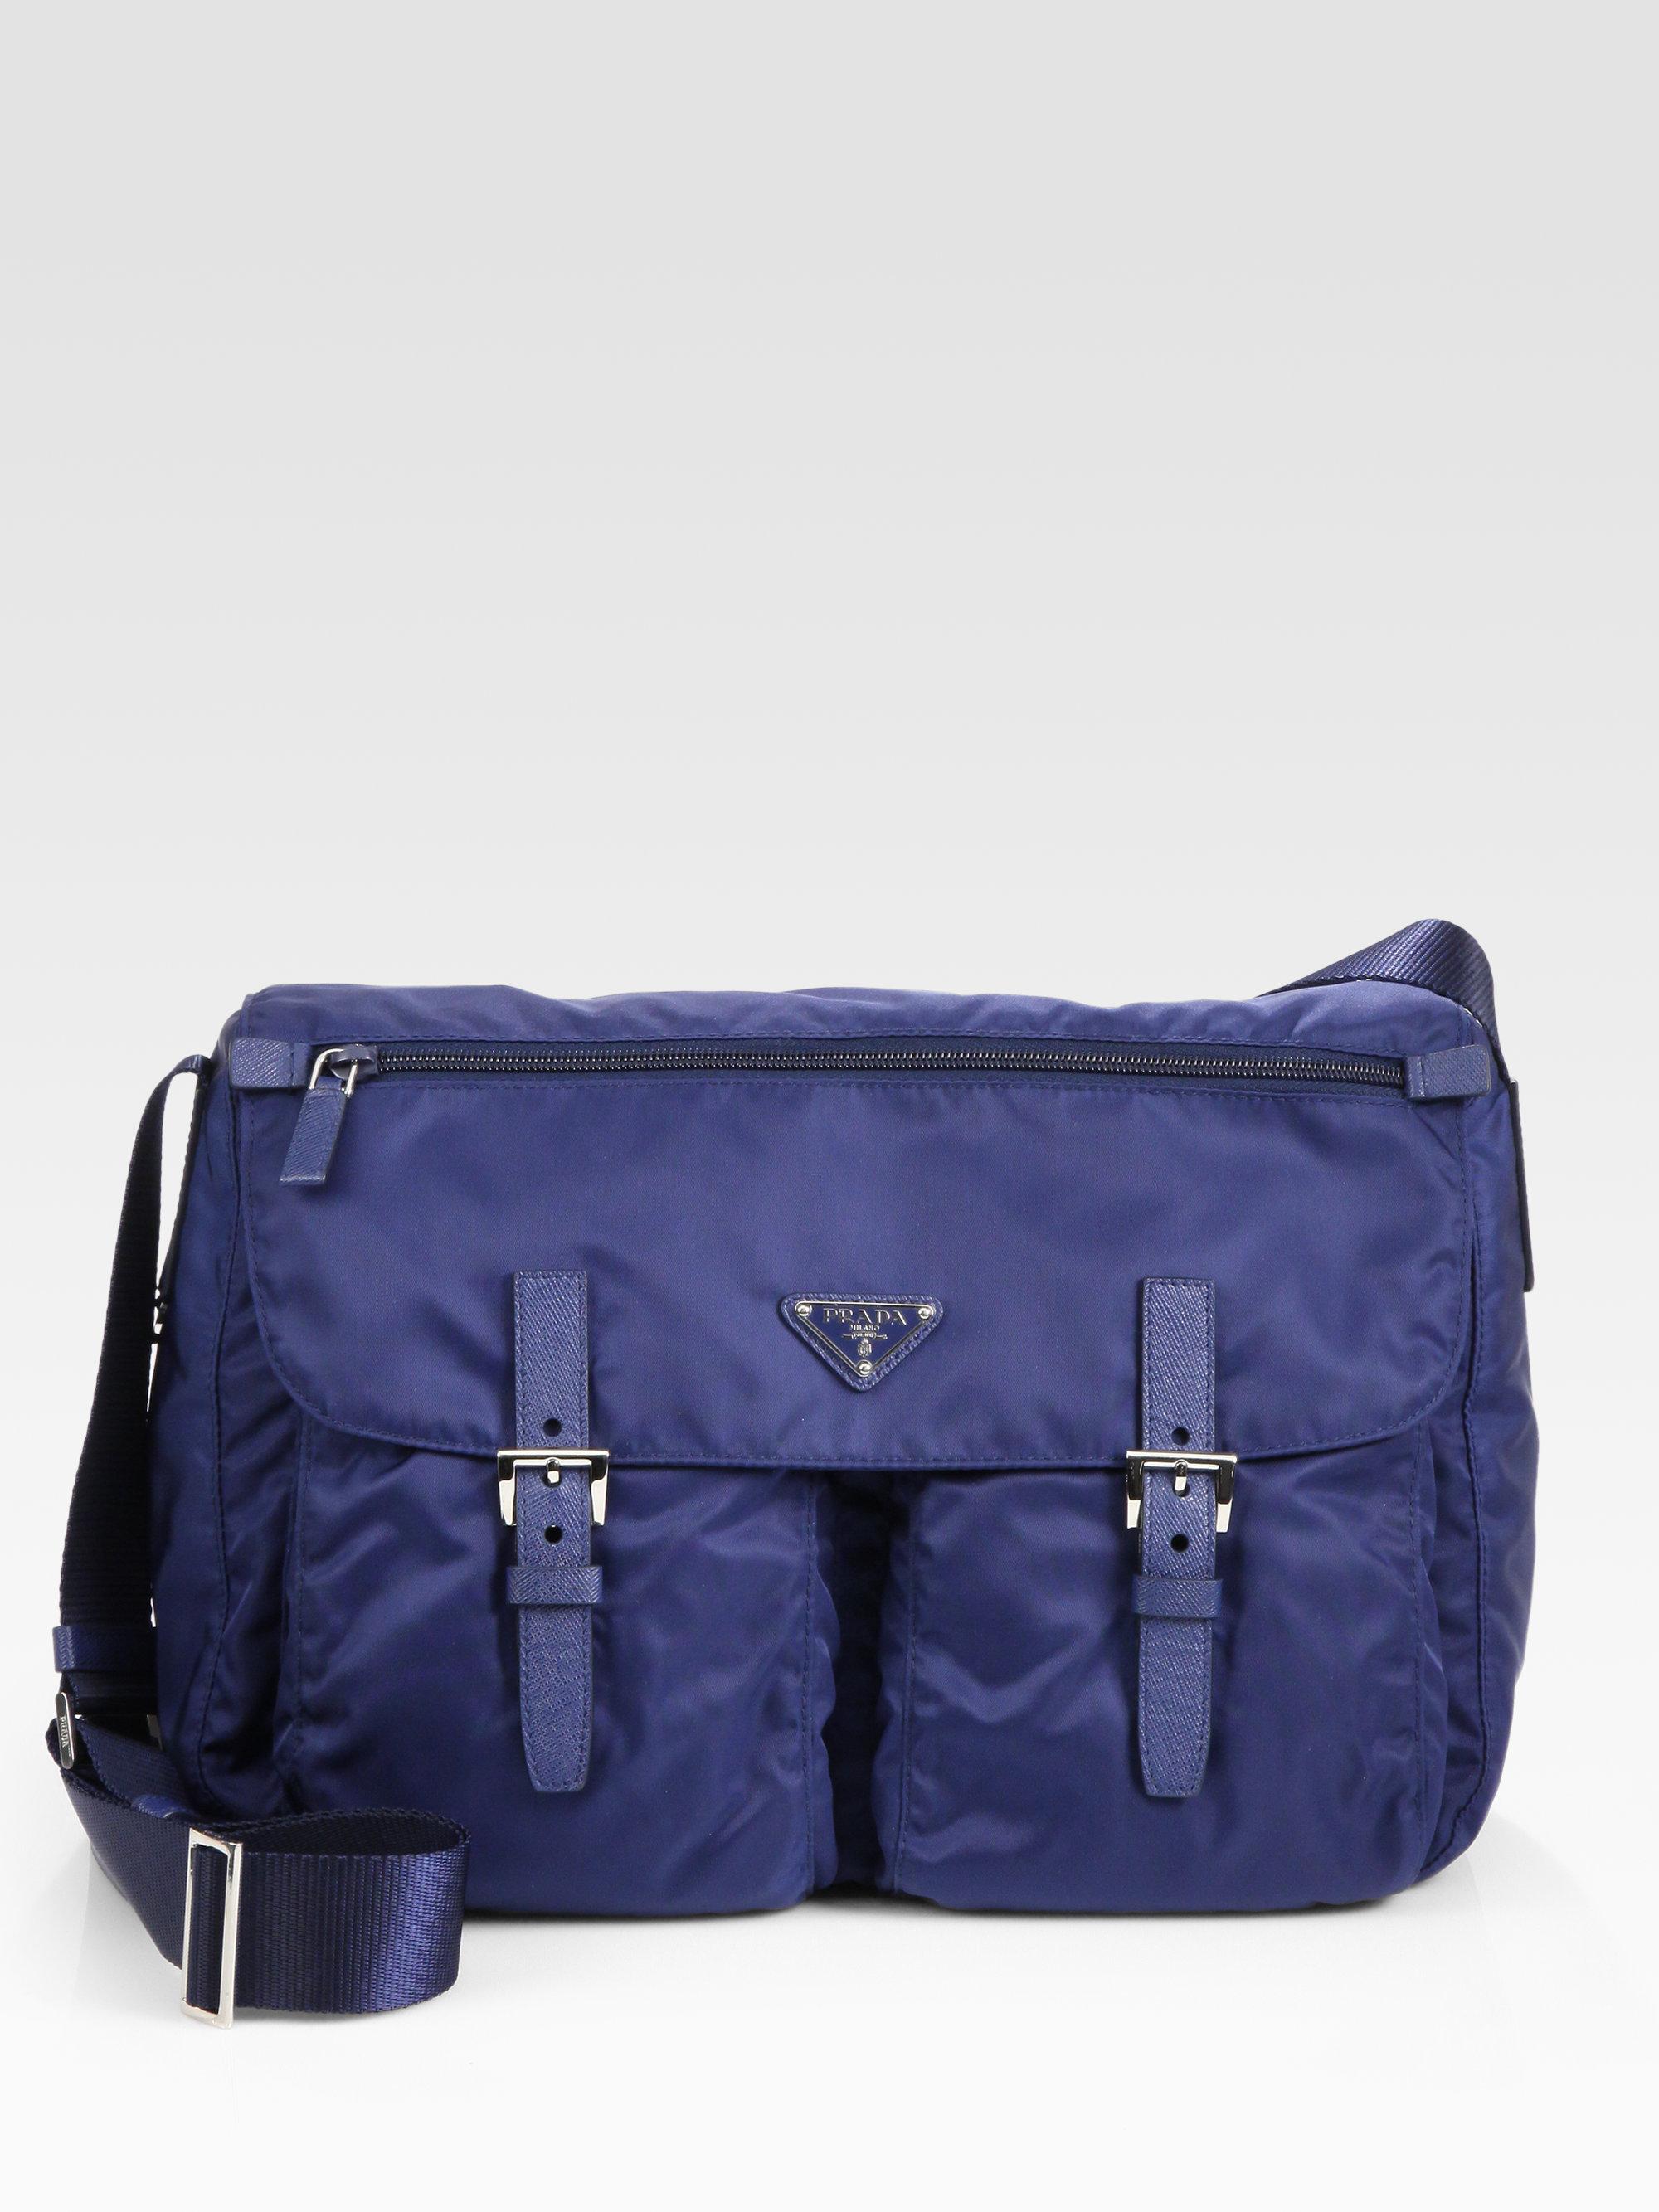 0dc8972a0ef5 ... discount lyst prada vela two pocket messenger bag in blue e035c 0bf82